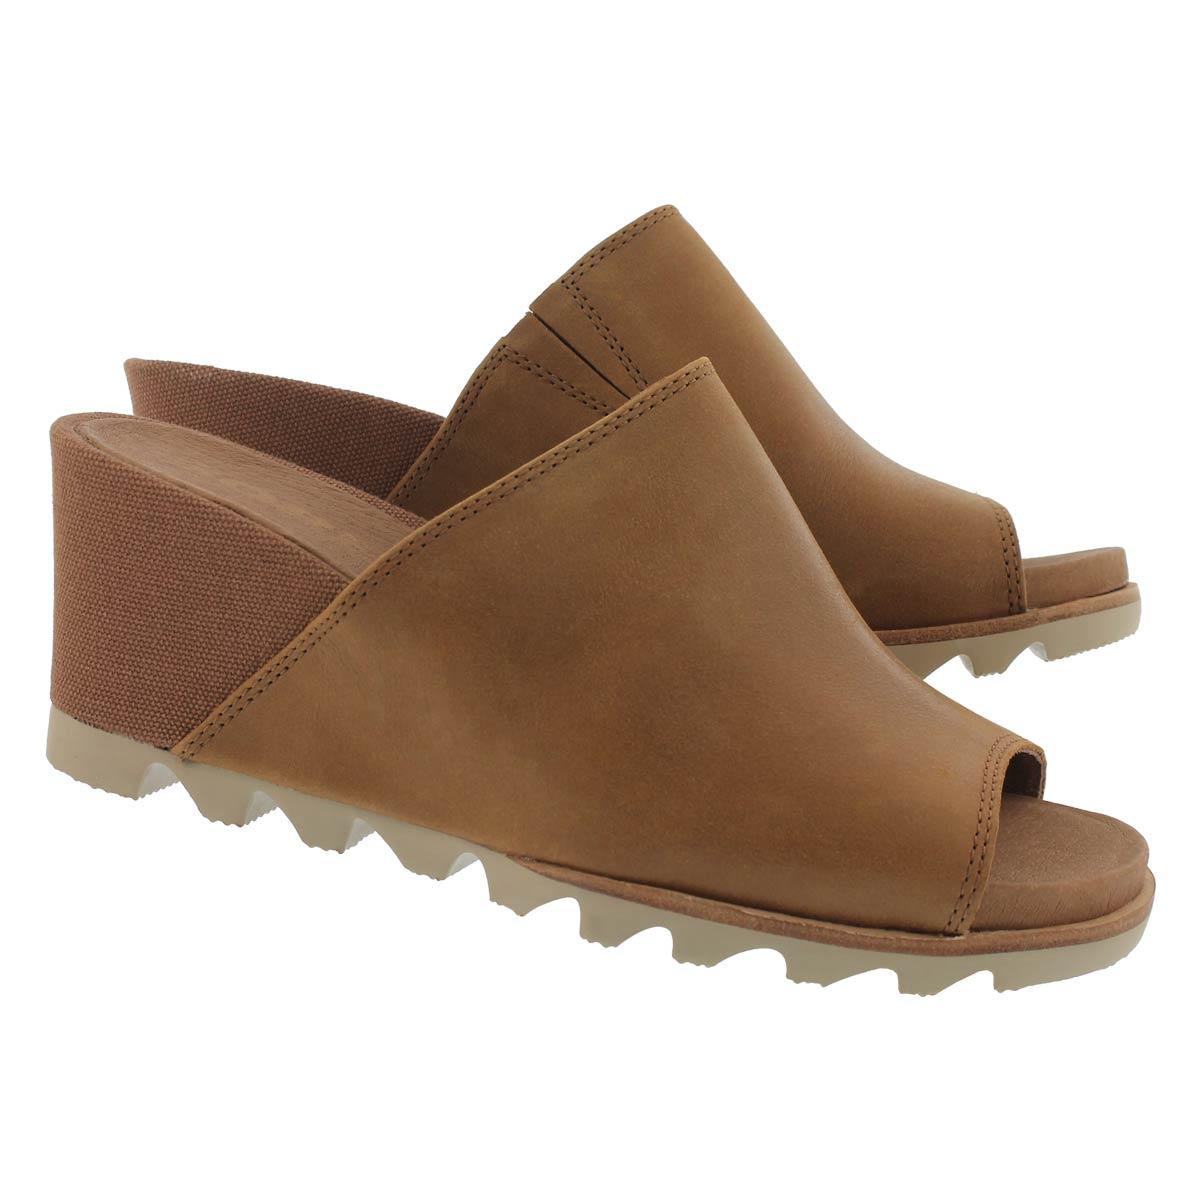 Lds Joanie Mule II cml brn wedge sandal